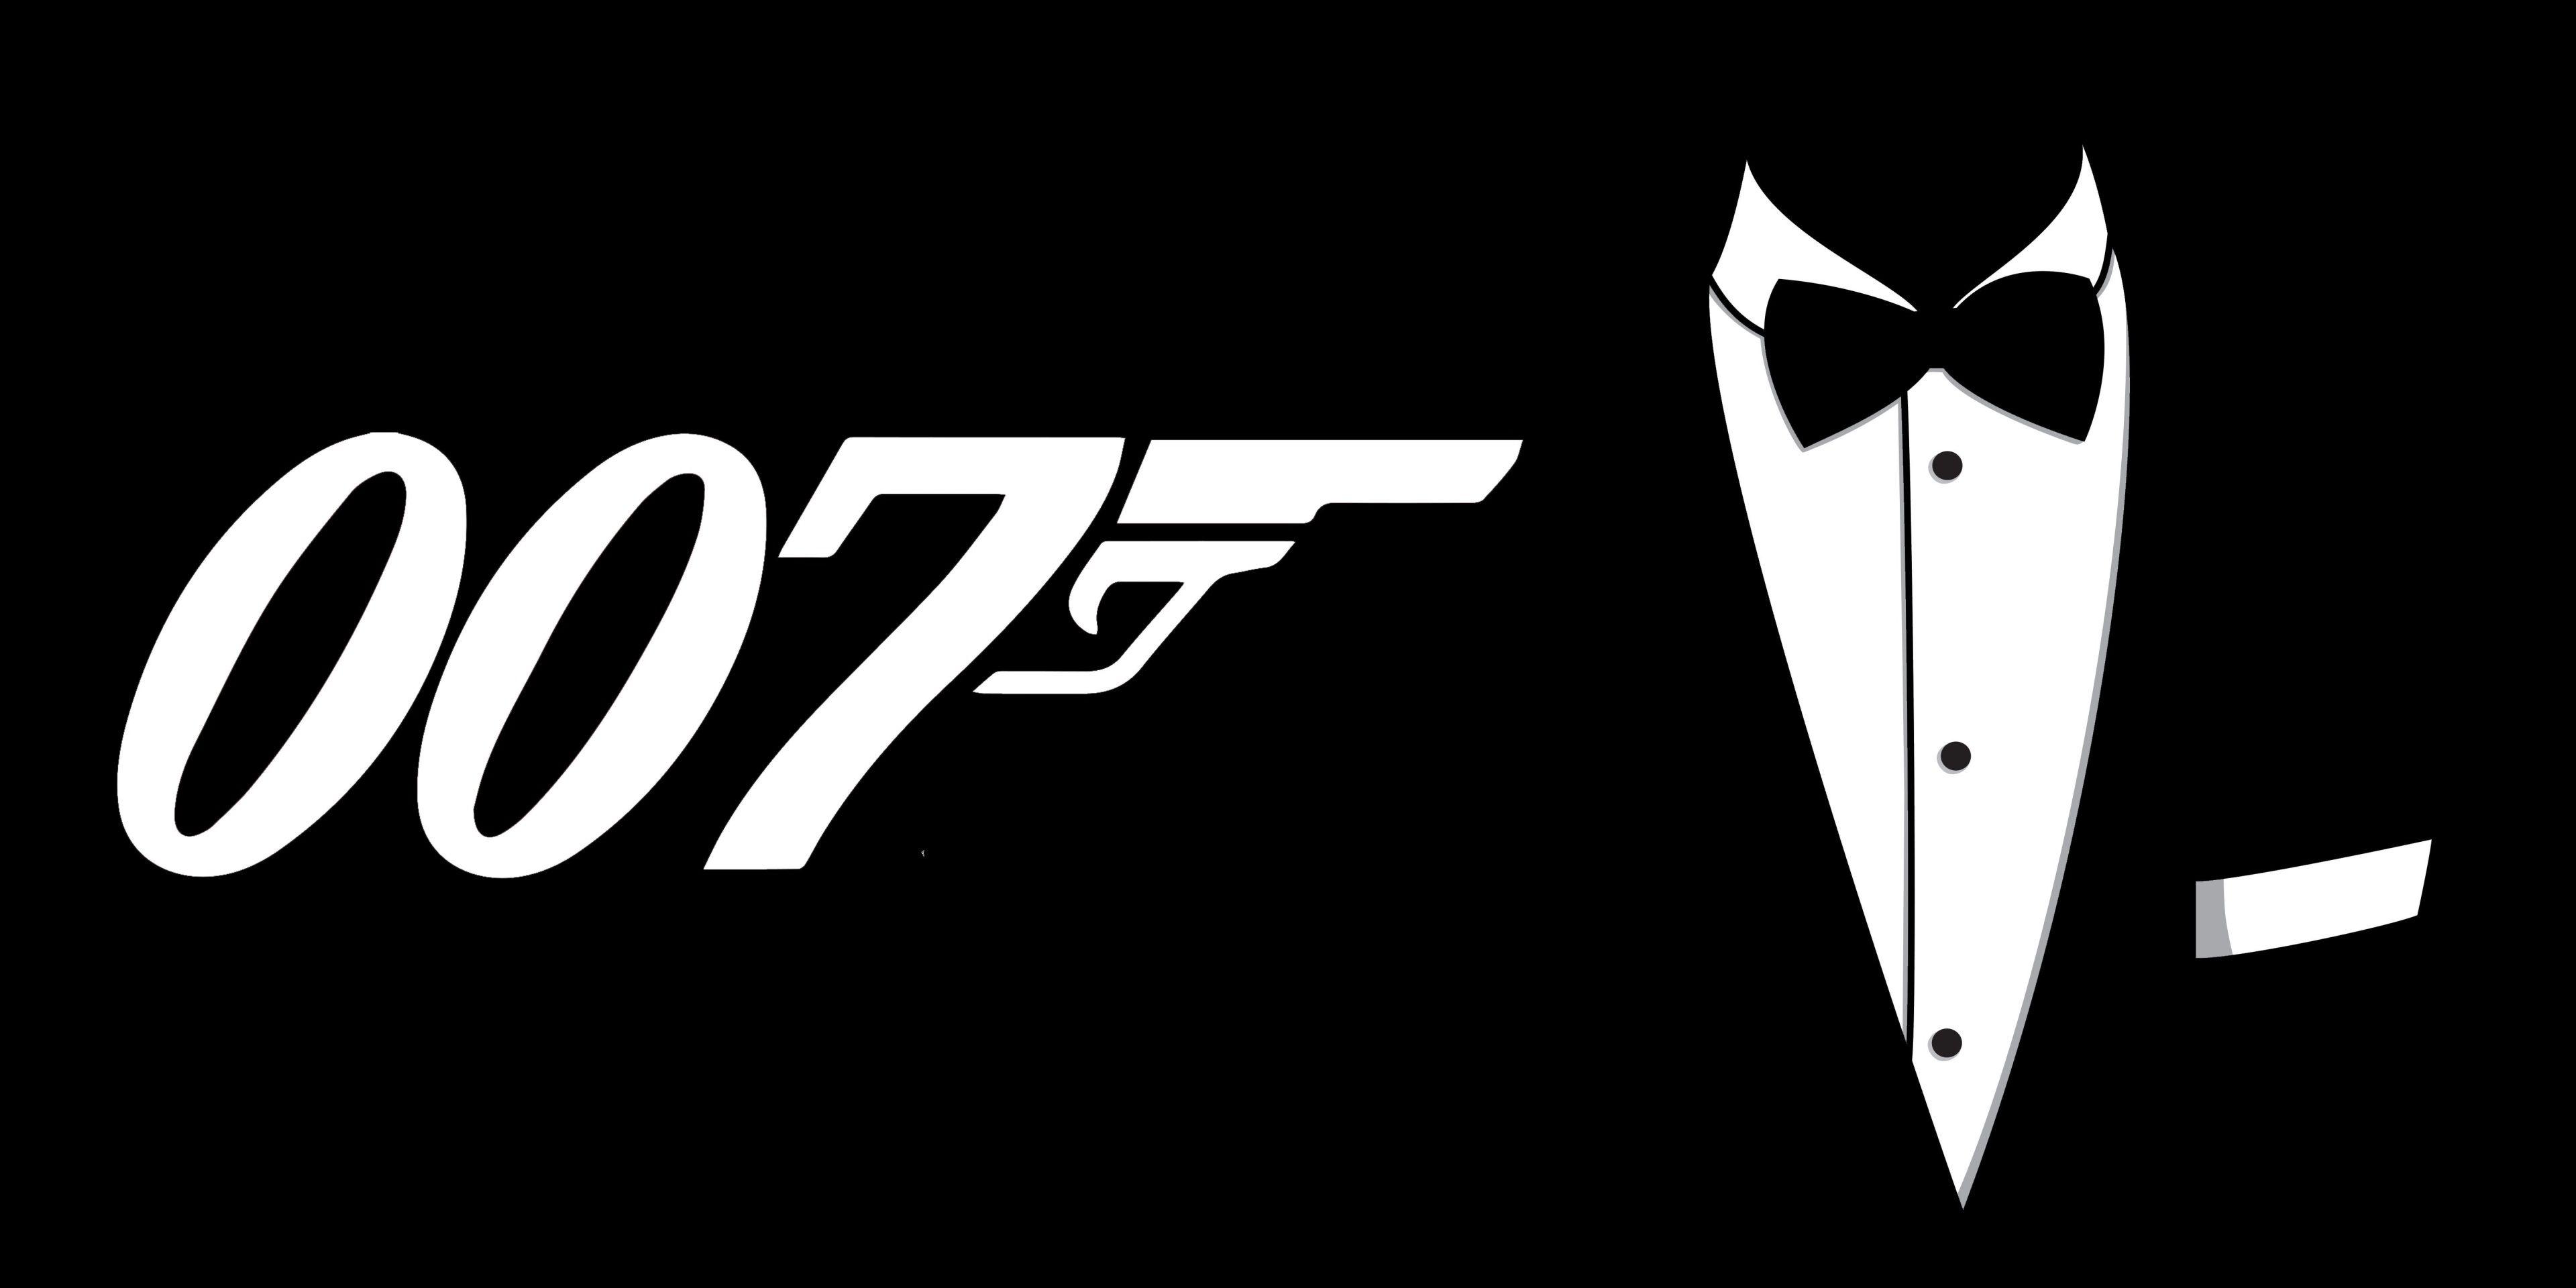 3840x1920 4k Best Wallpaper Ever In 2020 James Bond 007 James Bond James Bond Party